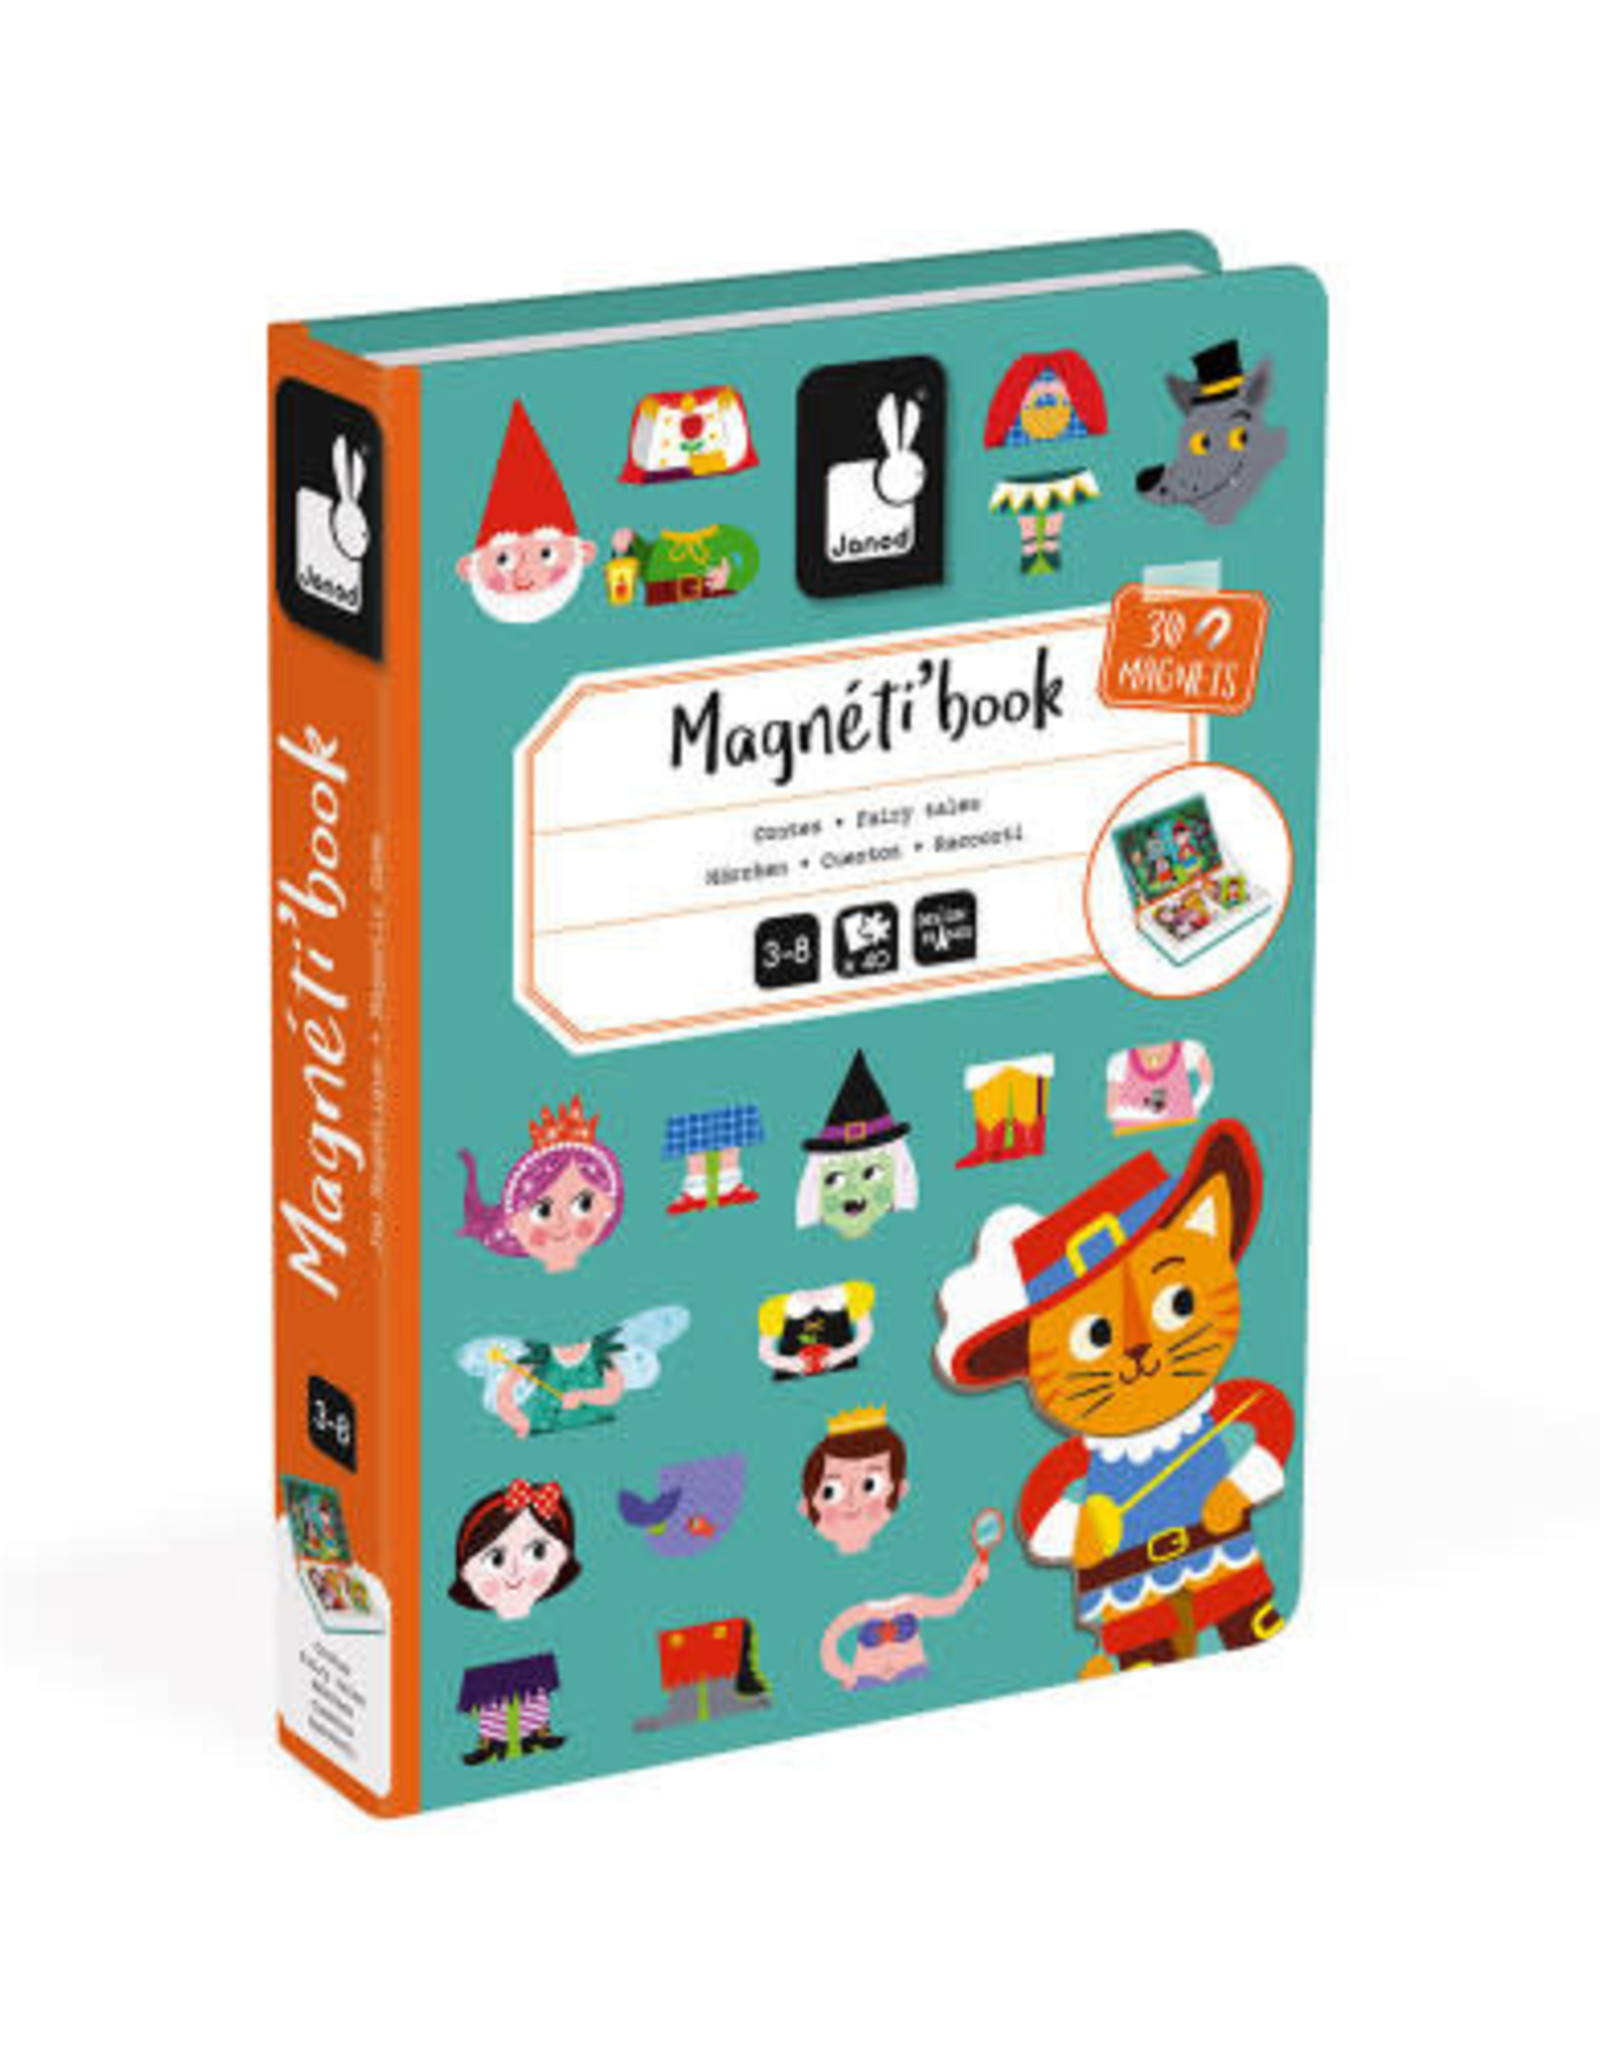 Janod magneti'book- fairy tales